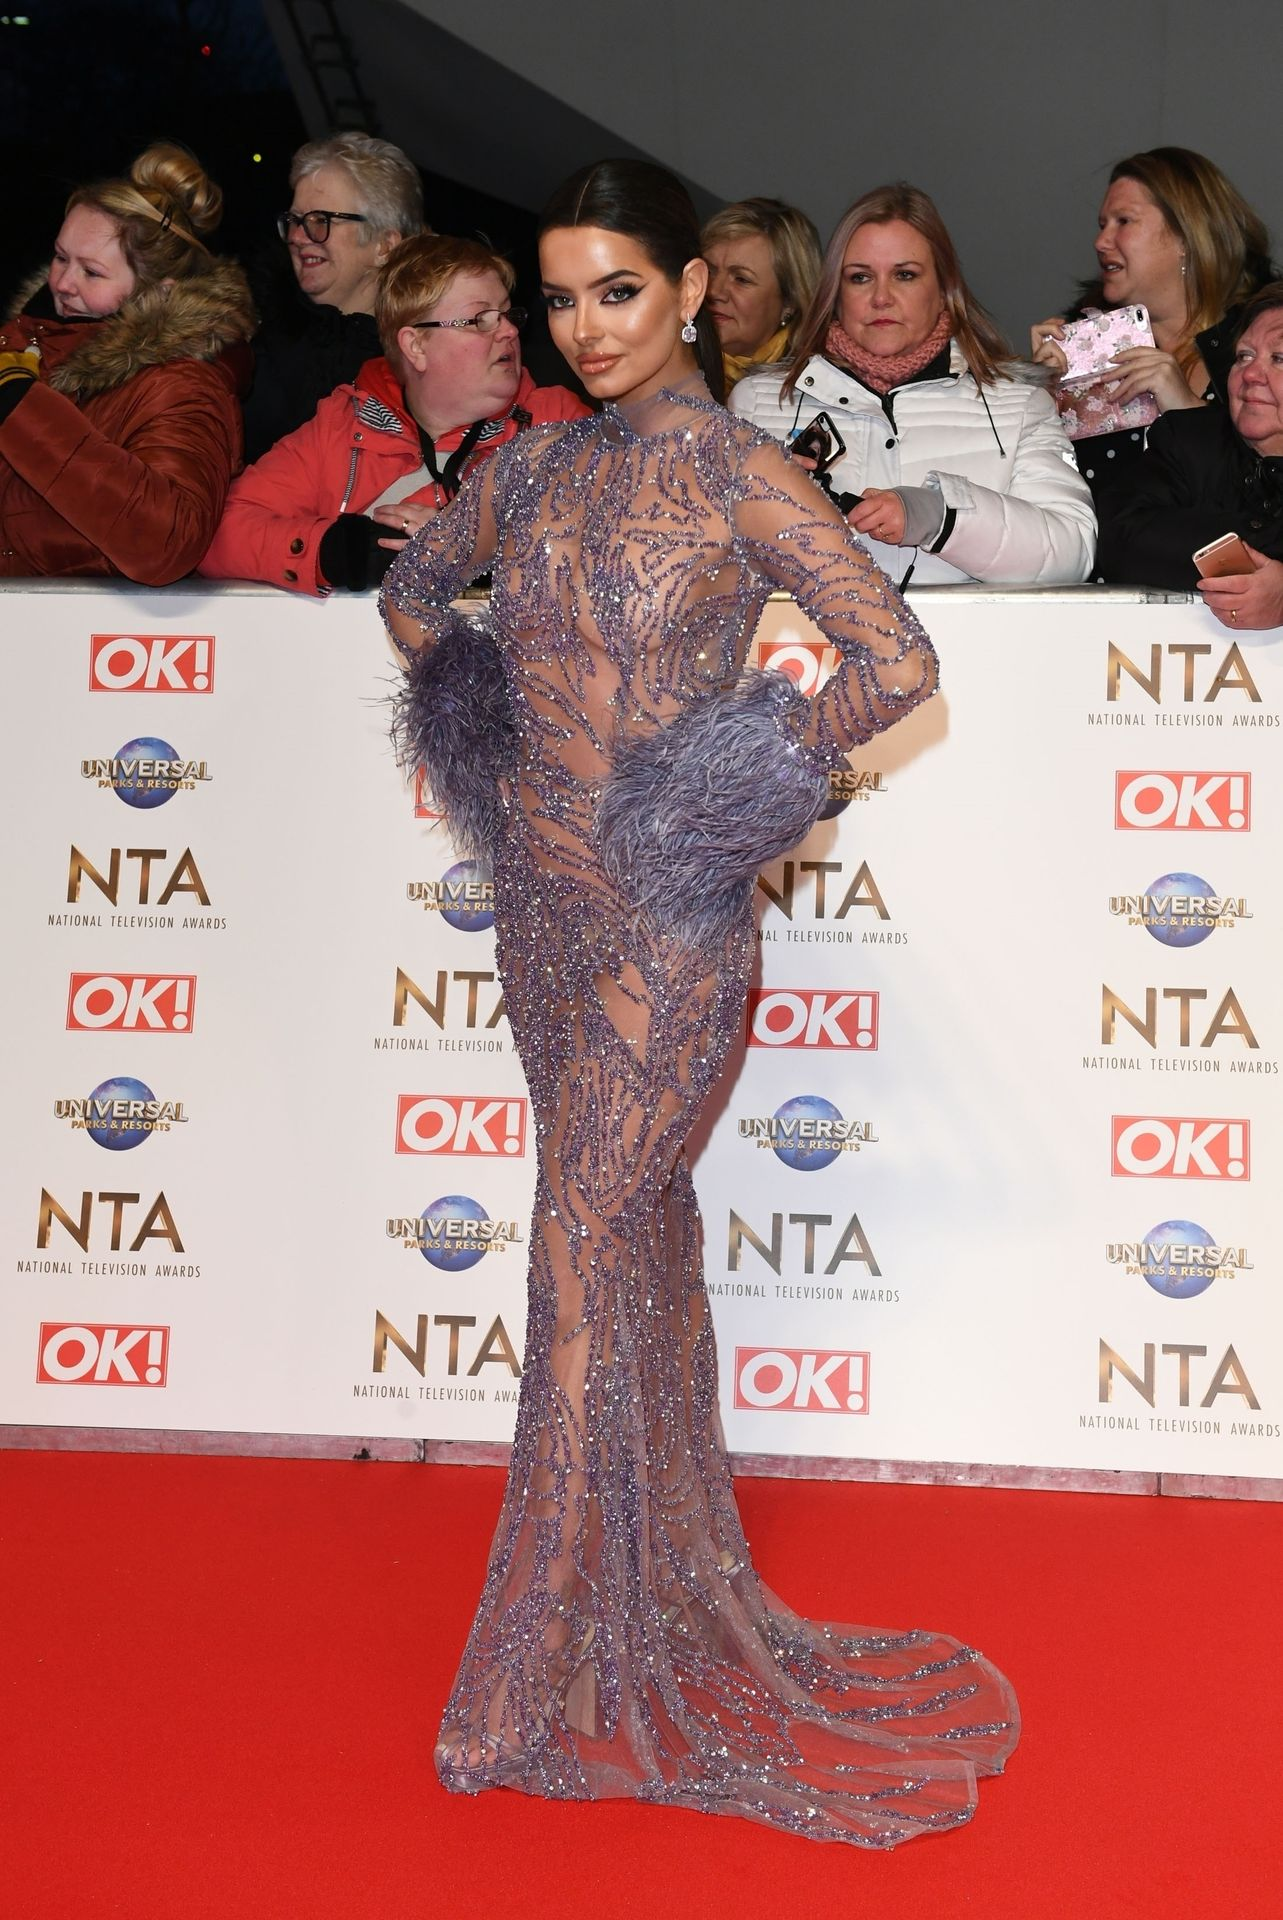 Maura Higgins Looks Hot At The National Television Awards 0003